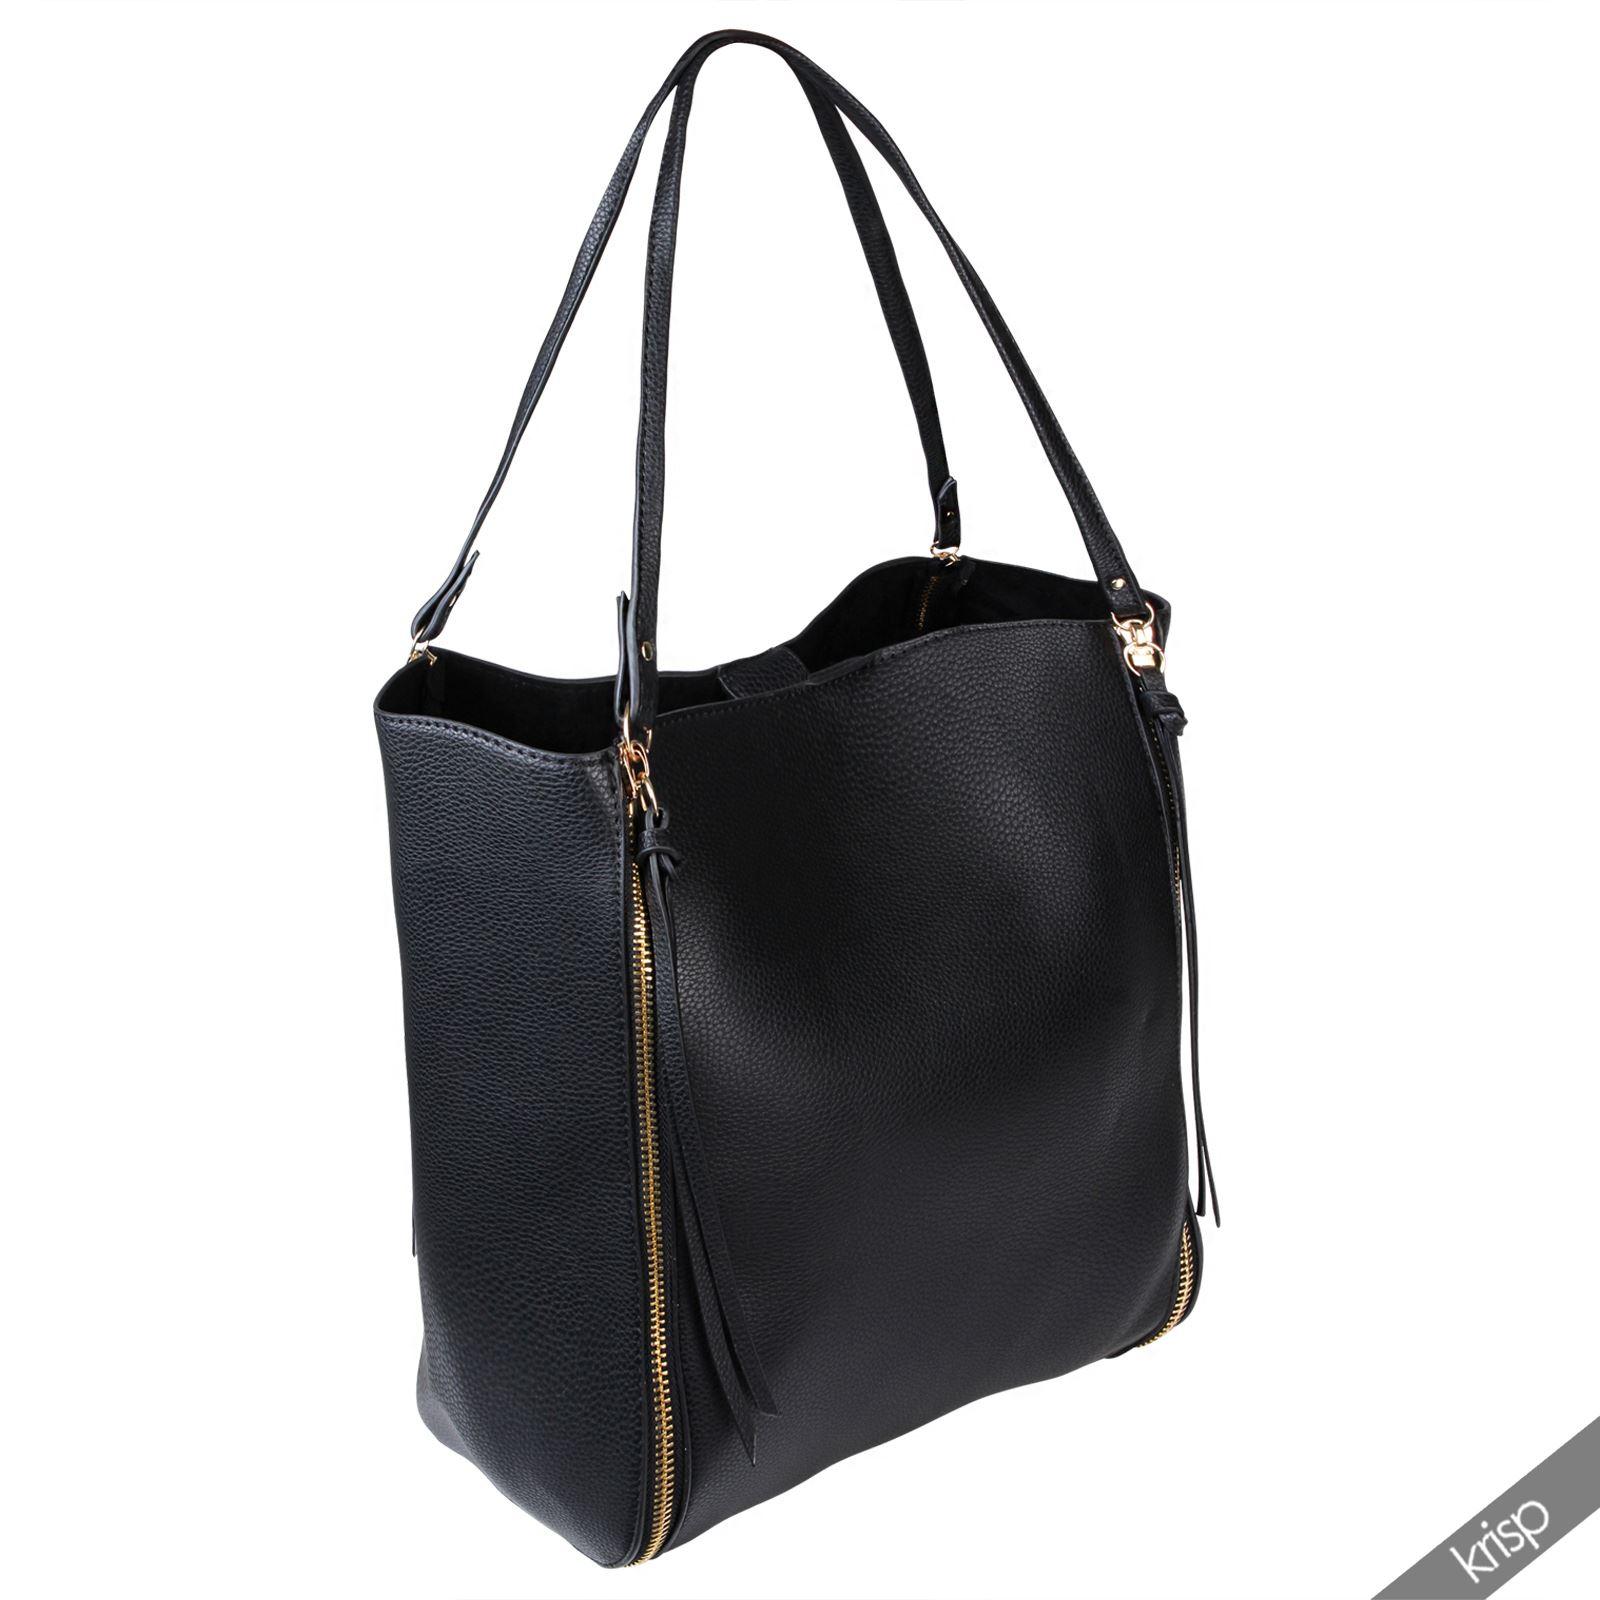 womens zipper tassel leather shopper hobo bag large tote. Black Bedroom Furniture Sets. Home Design Ideas